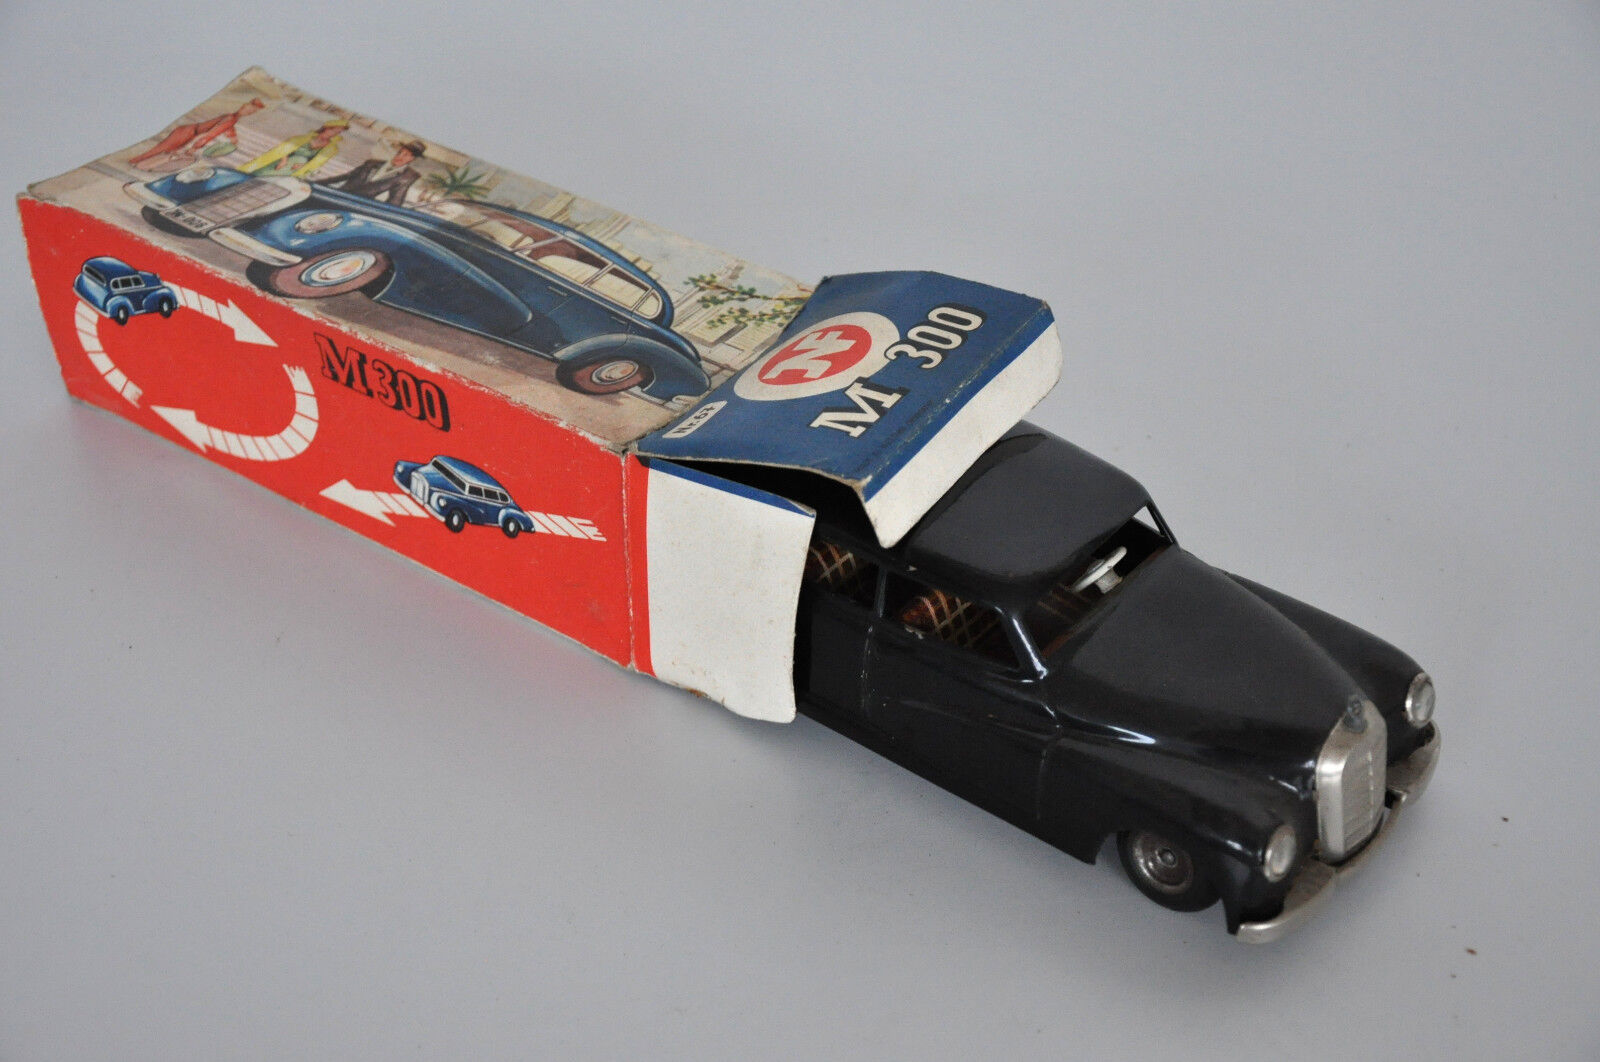 JNF M300 Mercedes Benz Blechspielzeug in Reprobox Nr. 67